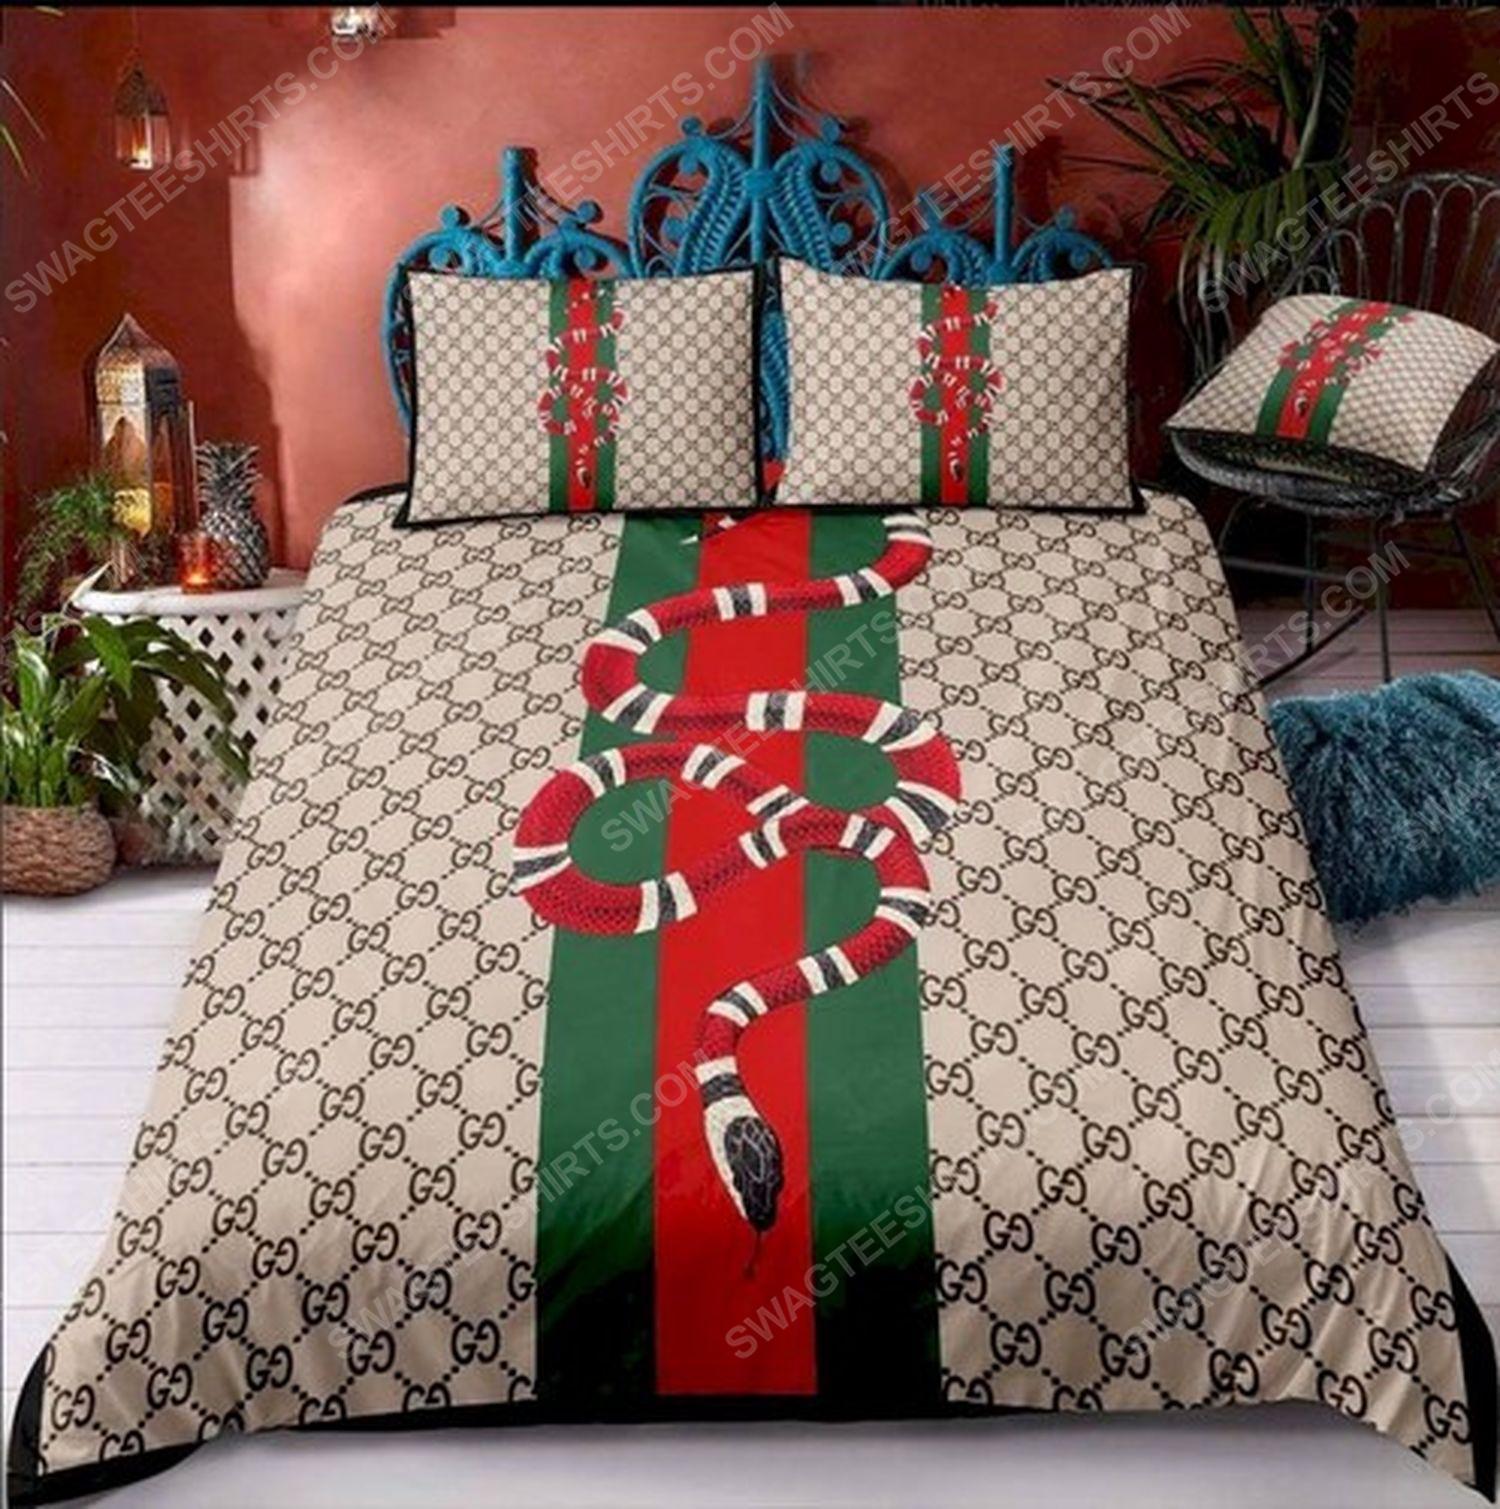 Gucci and snack symbols full print duvet cover bedding set 2